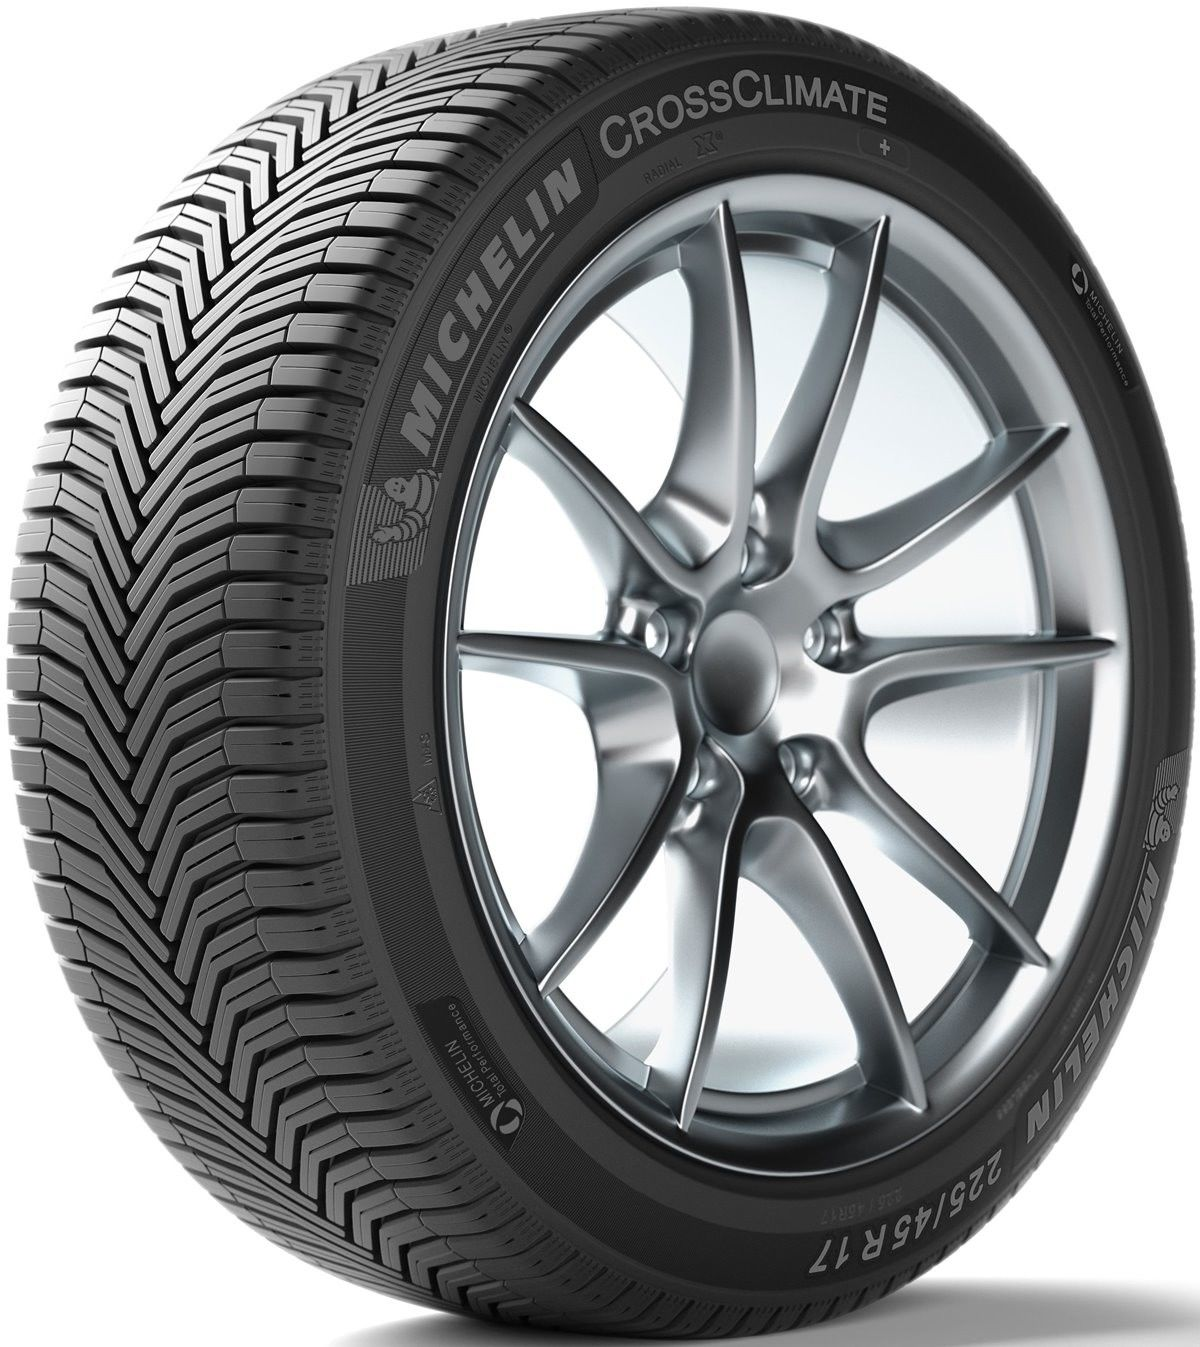 Michelin CROSSCLIMATE 185/55 R15 86 H